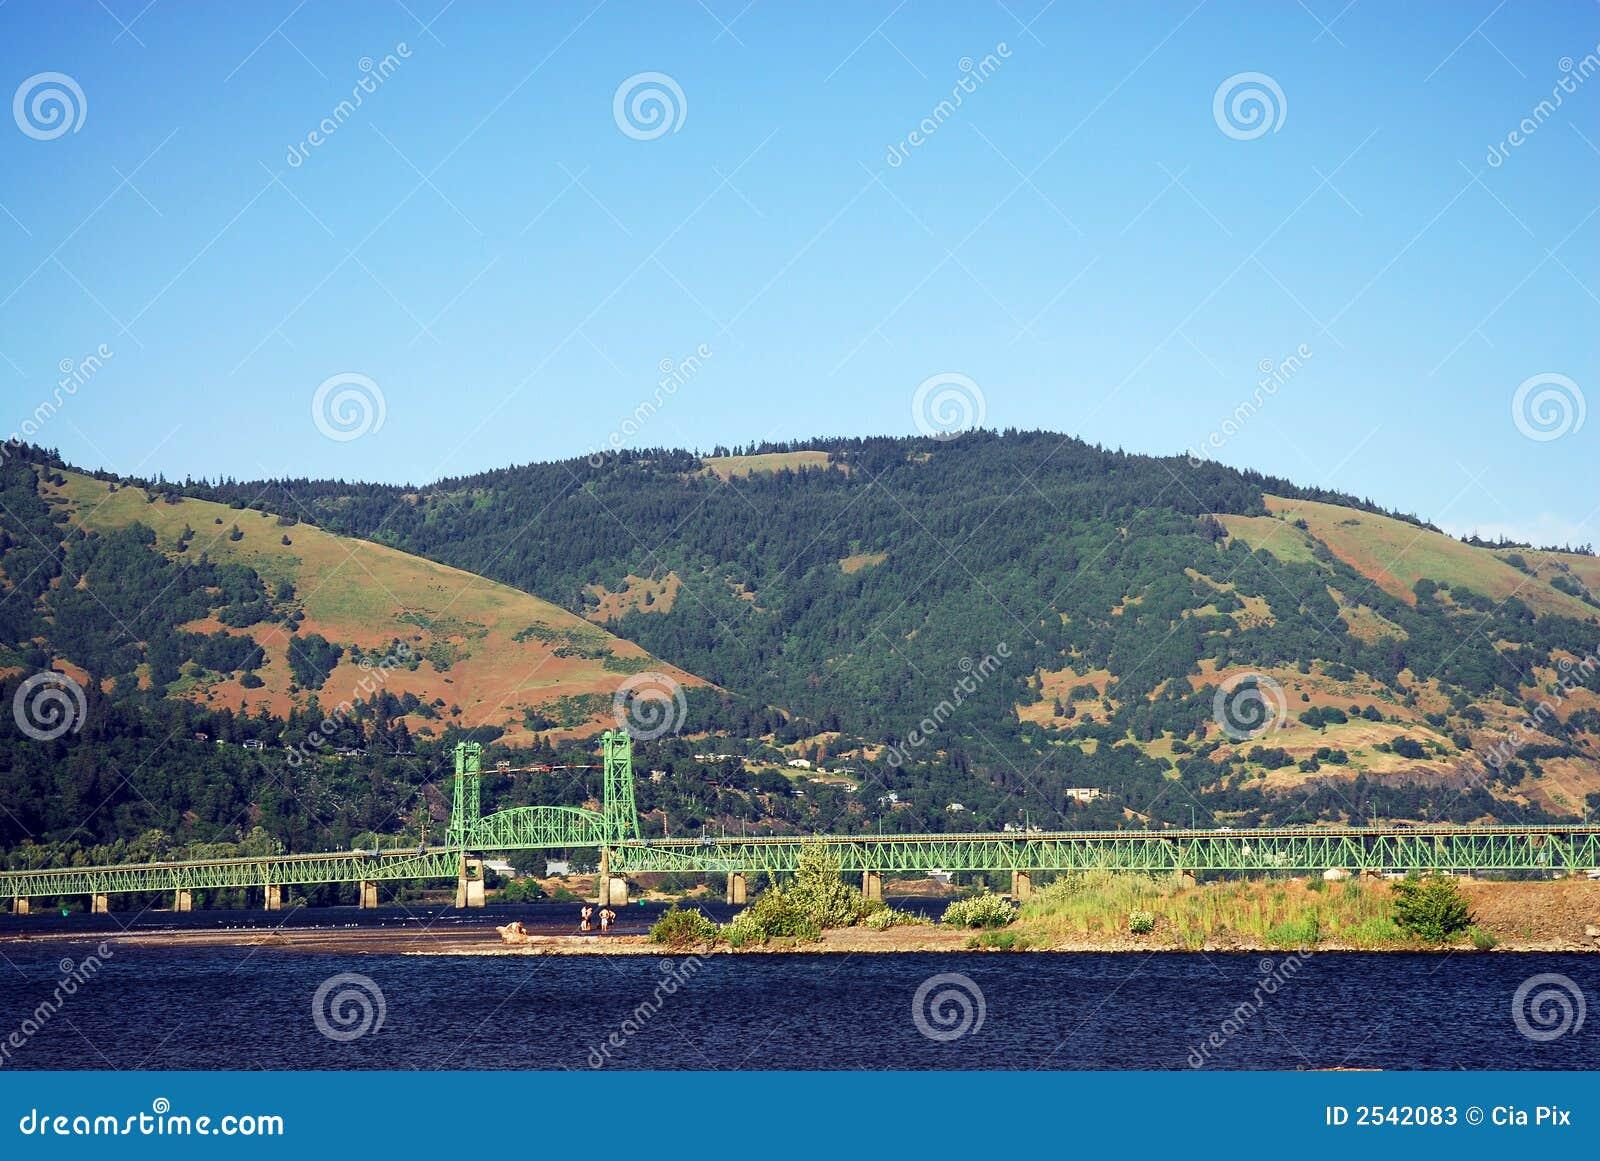 Columbia River Stock Photos - Image: 2542083